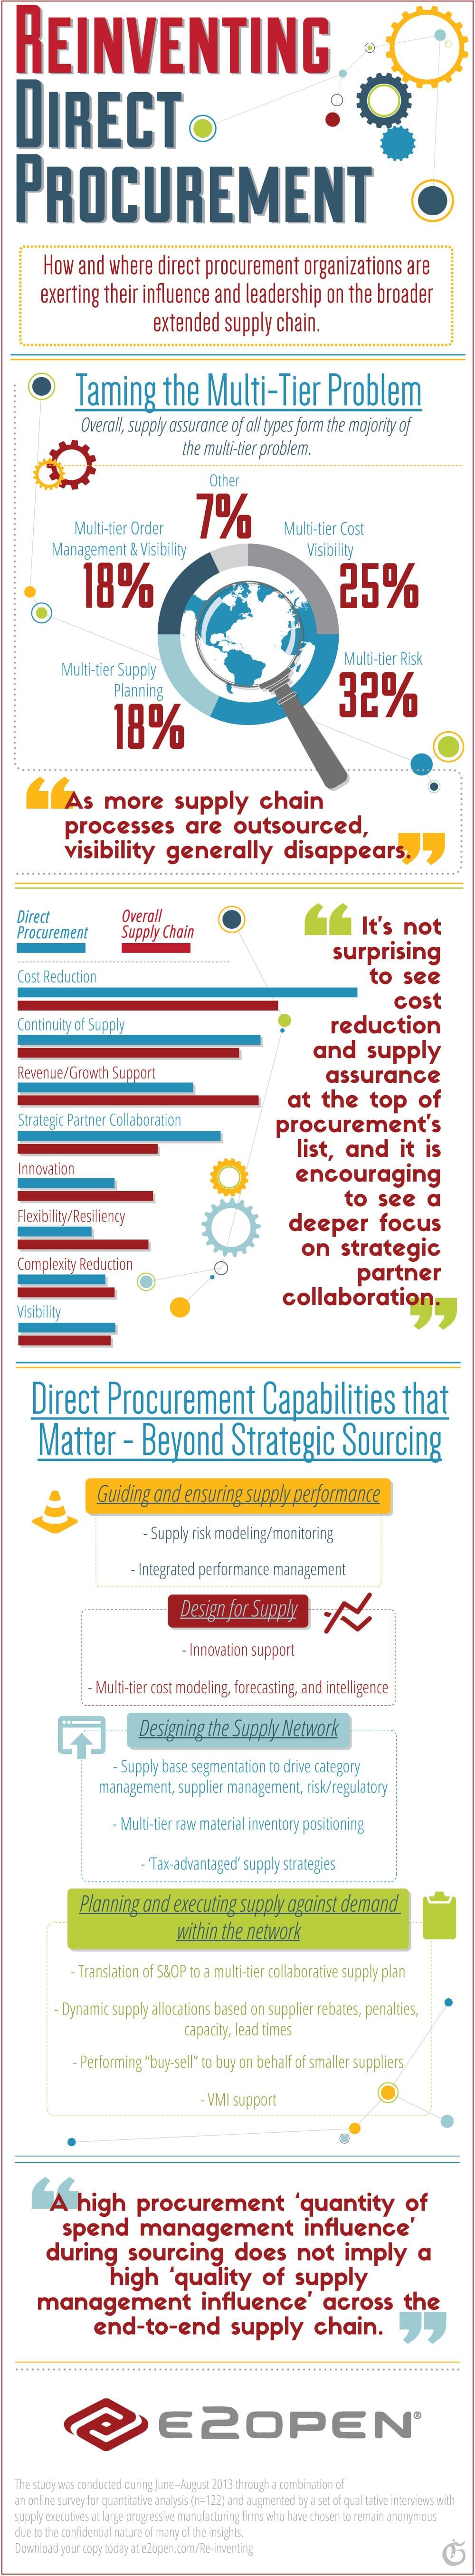 E2open - Reinventing Direct Procurement